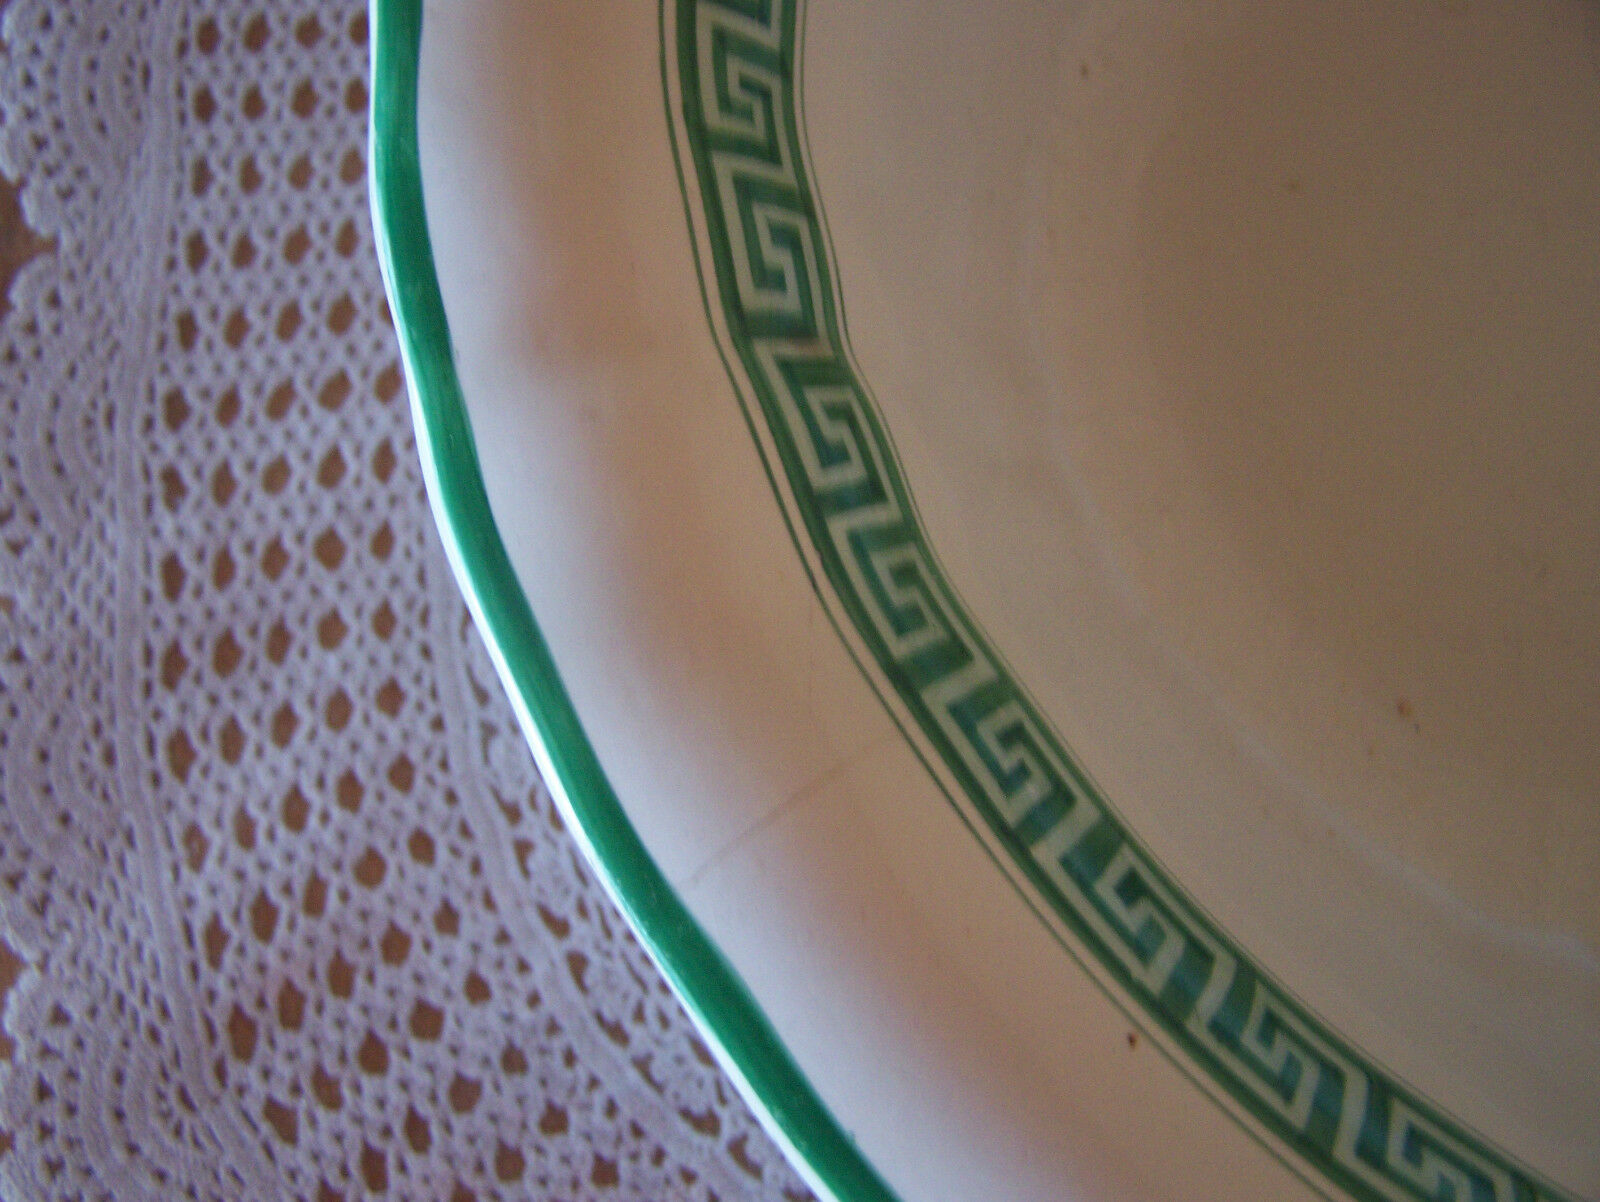 Keramikschüssel - Waschschüssel - Schüssel: Jacobi  Adler & Co., Neuleiningen